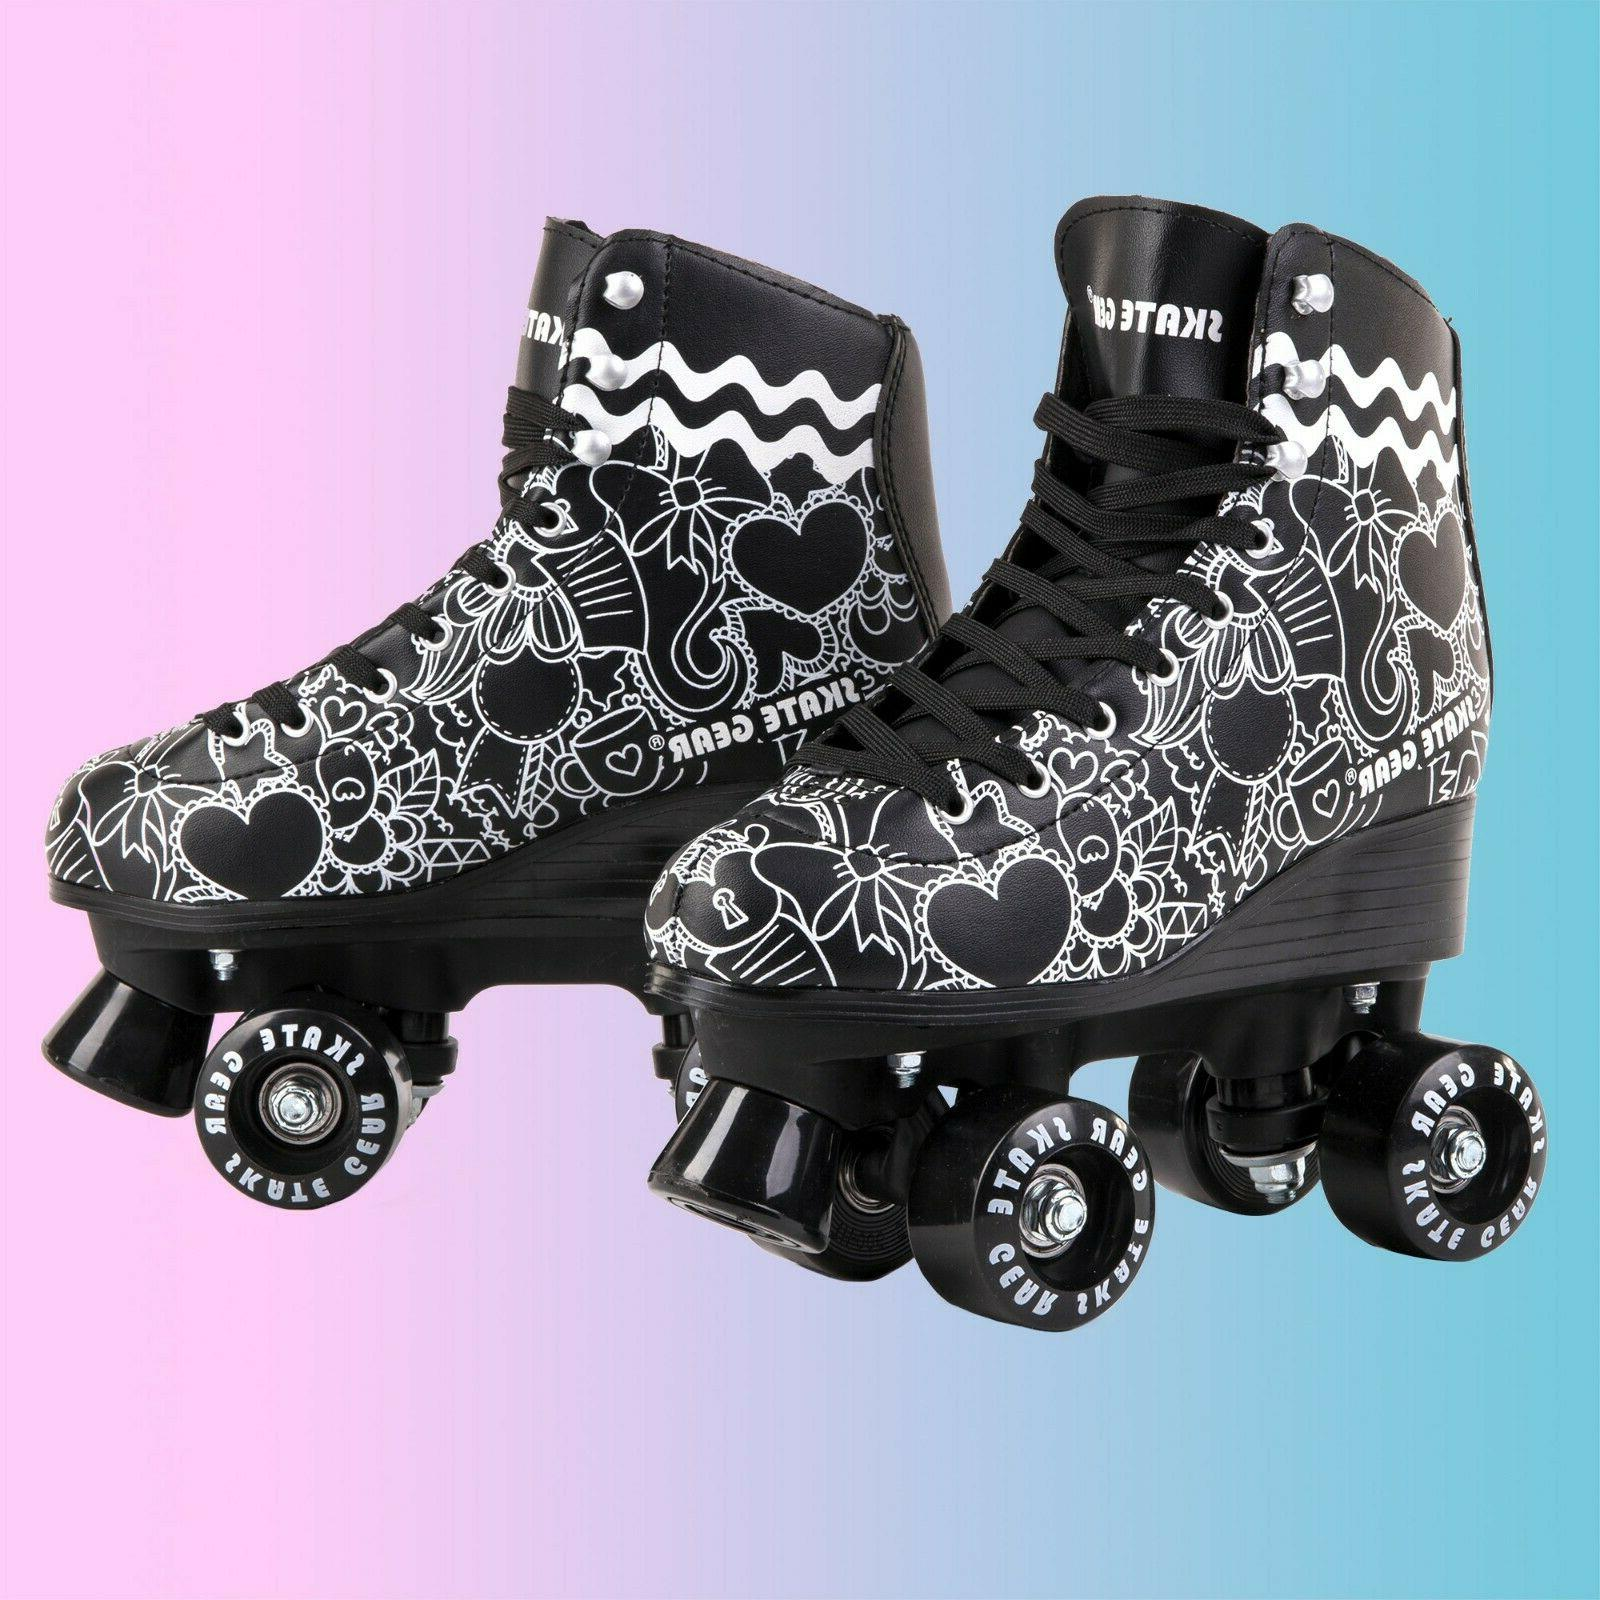 cal 7 roller skates indoor outdoor skating